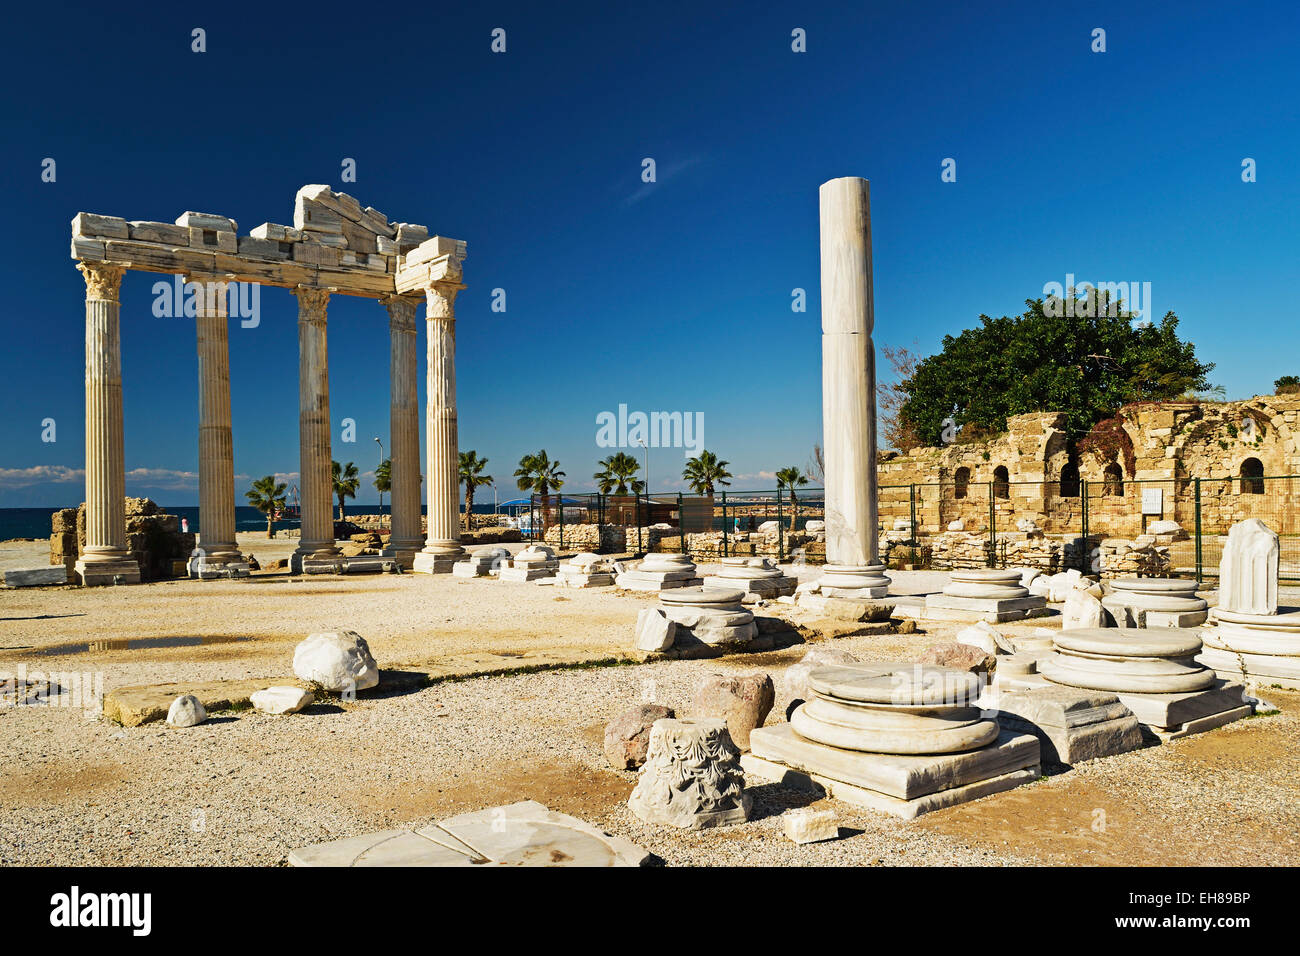 Temple of Apollo, Side, Antalya Province, Anatolia, Turkey, Asia Minor, Eurasia - Stock Image